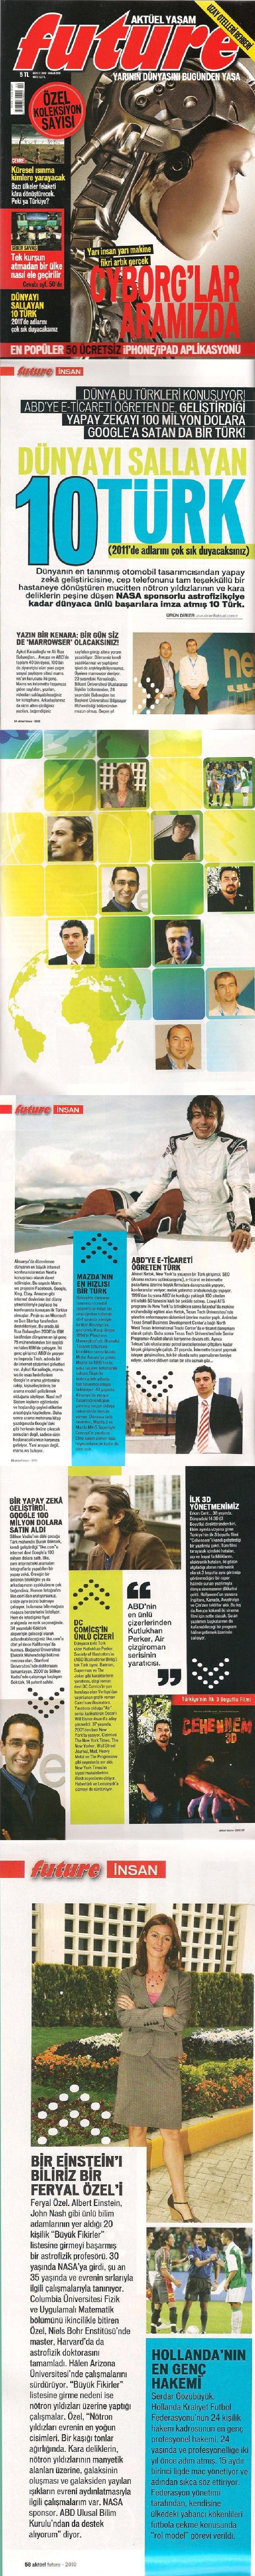 Aktuel Future Dergisi- Dunyayı sallayan 10 Turk